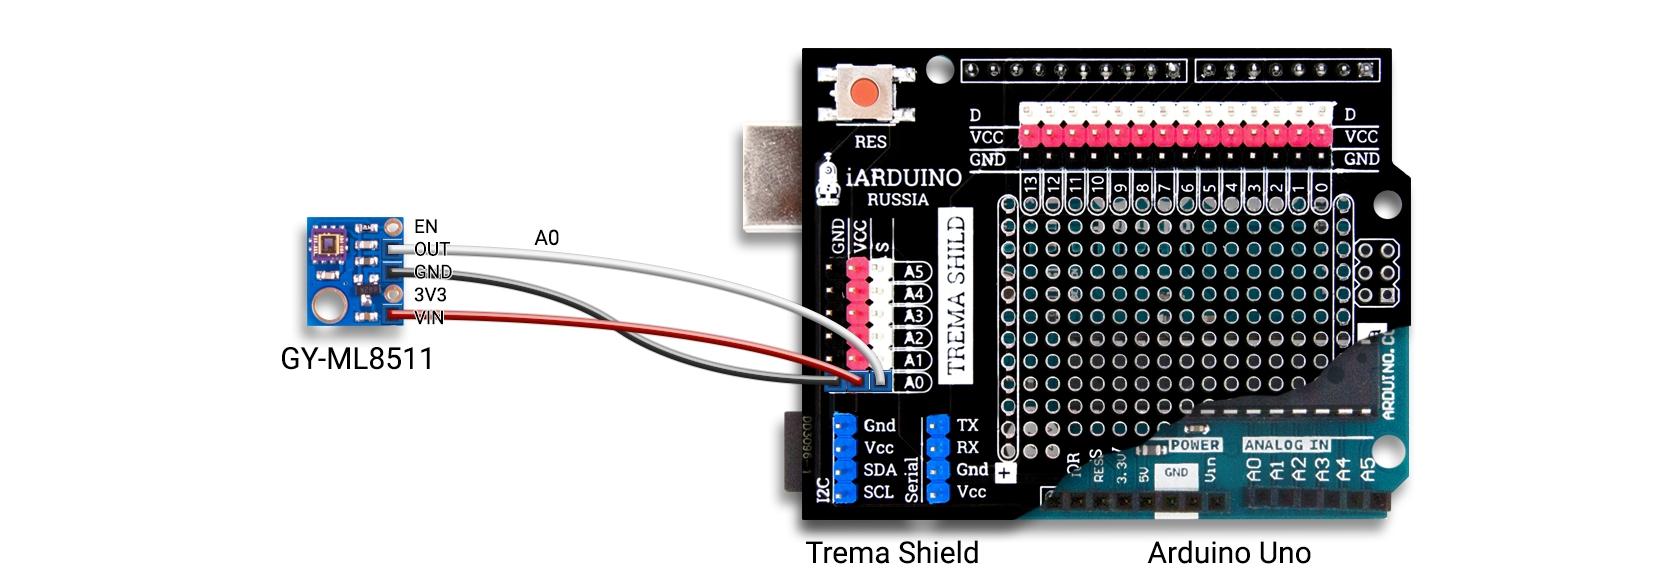 Подключение датчика GY-ML8511 к Arduino